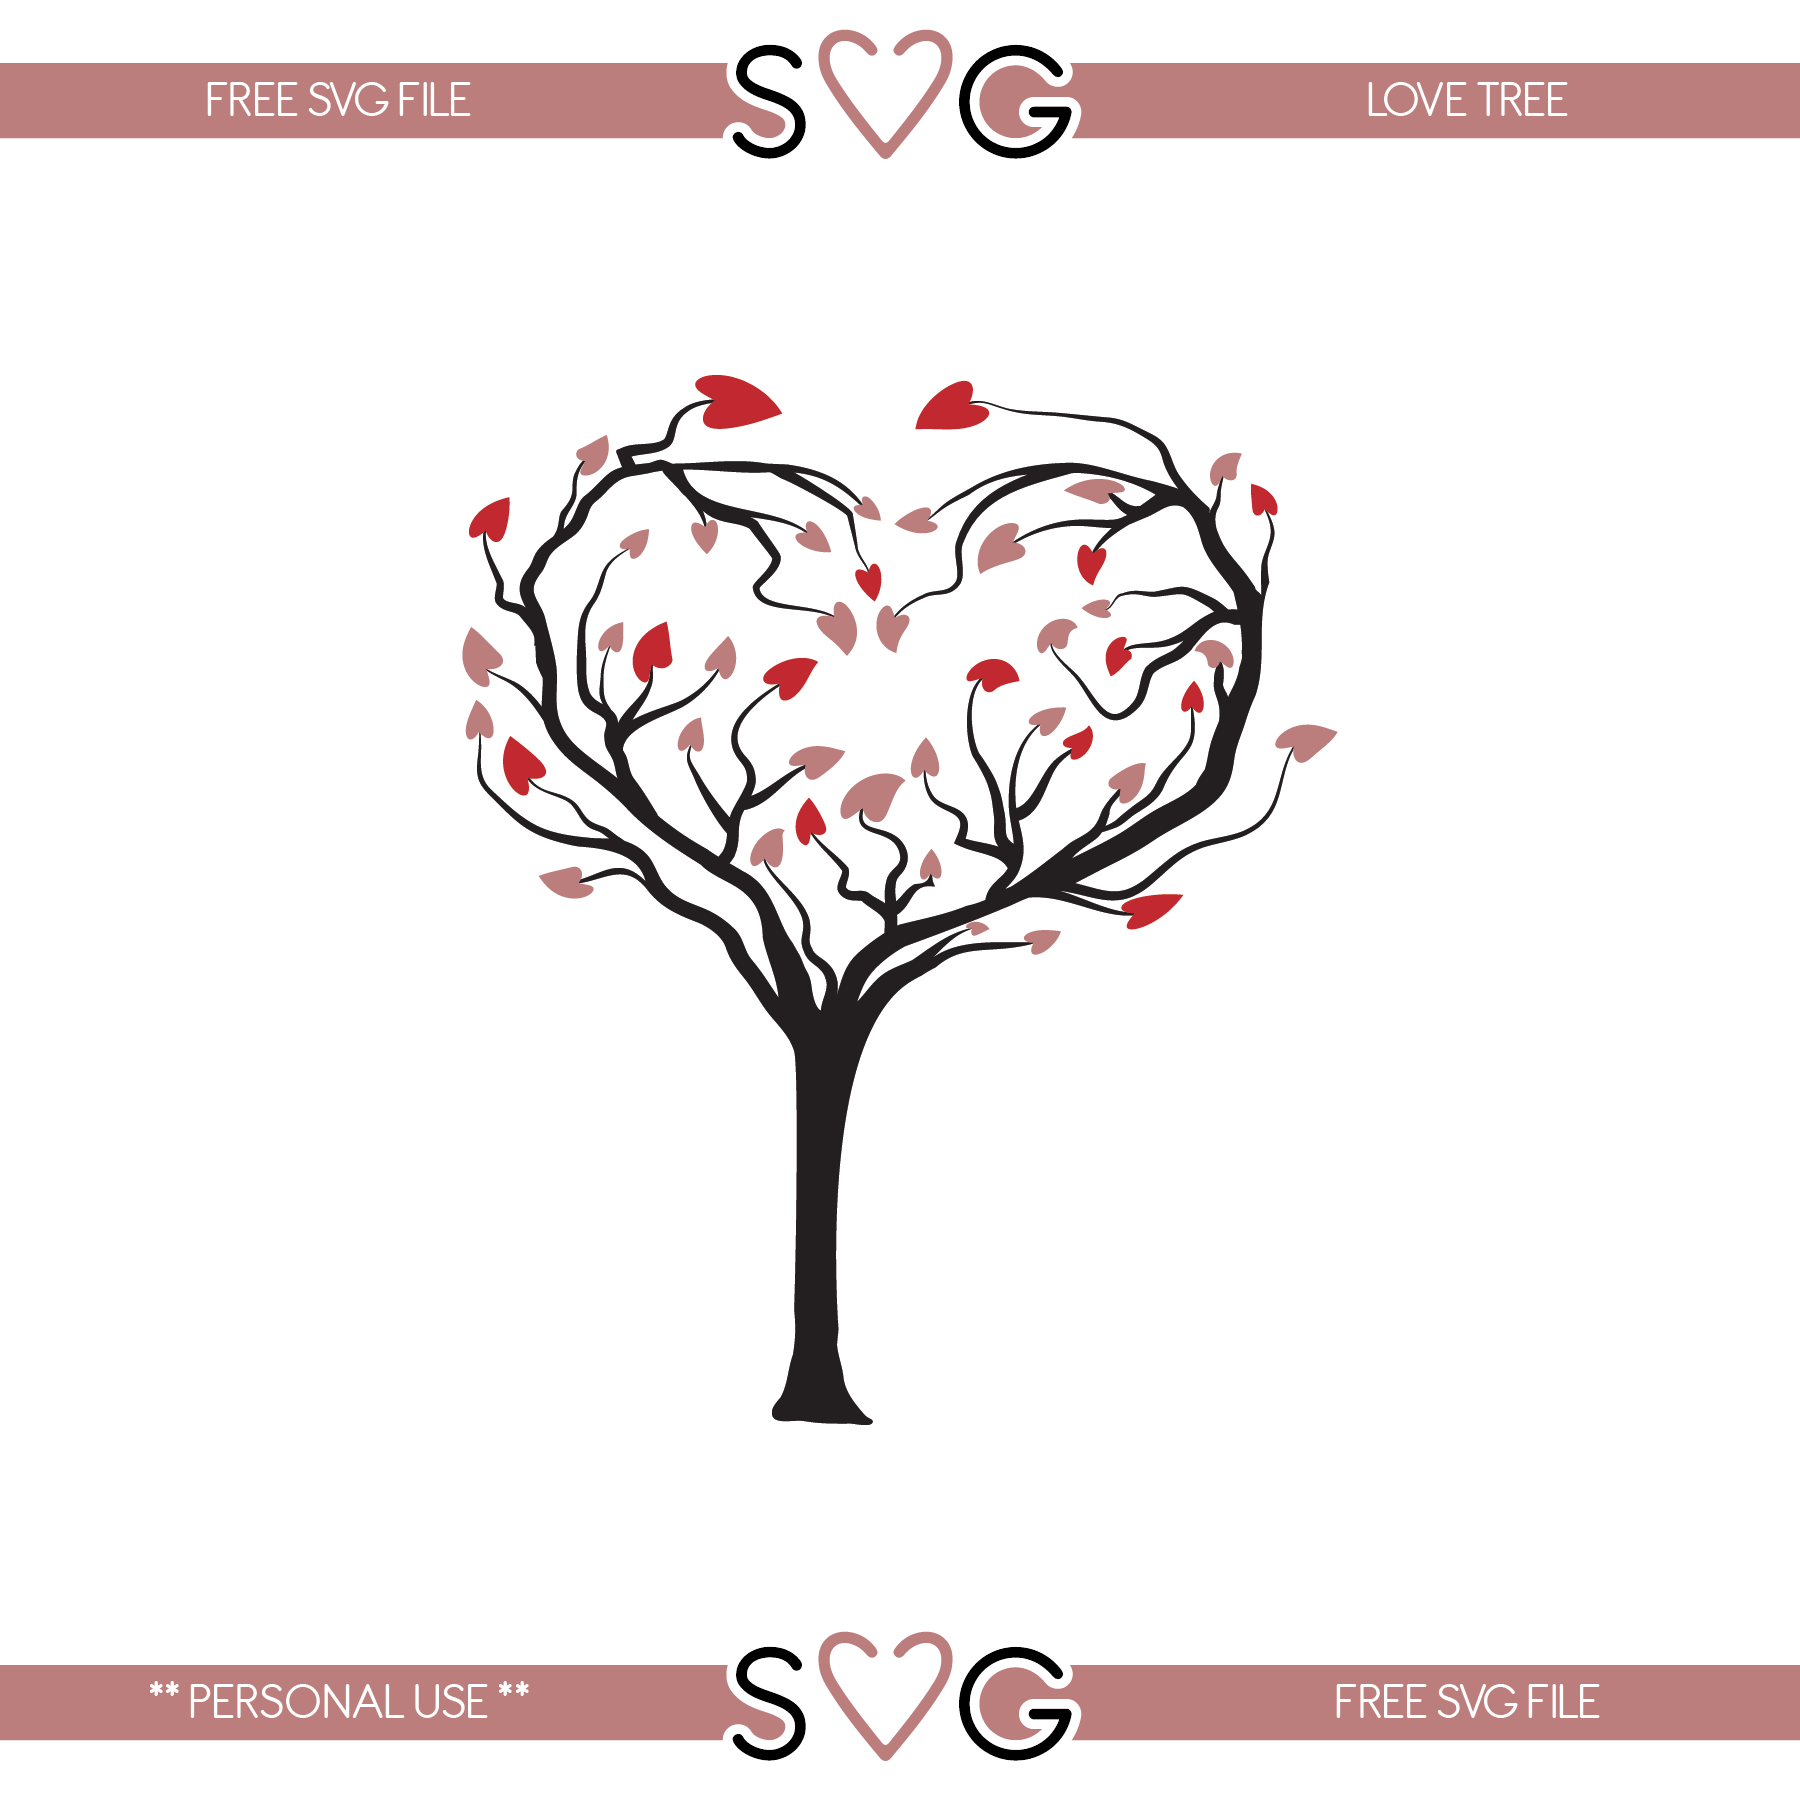 Free svg files Love tree Valentines svg, Free svg